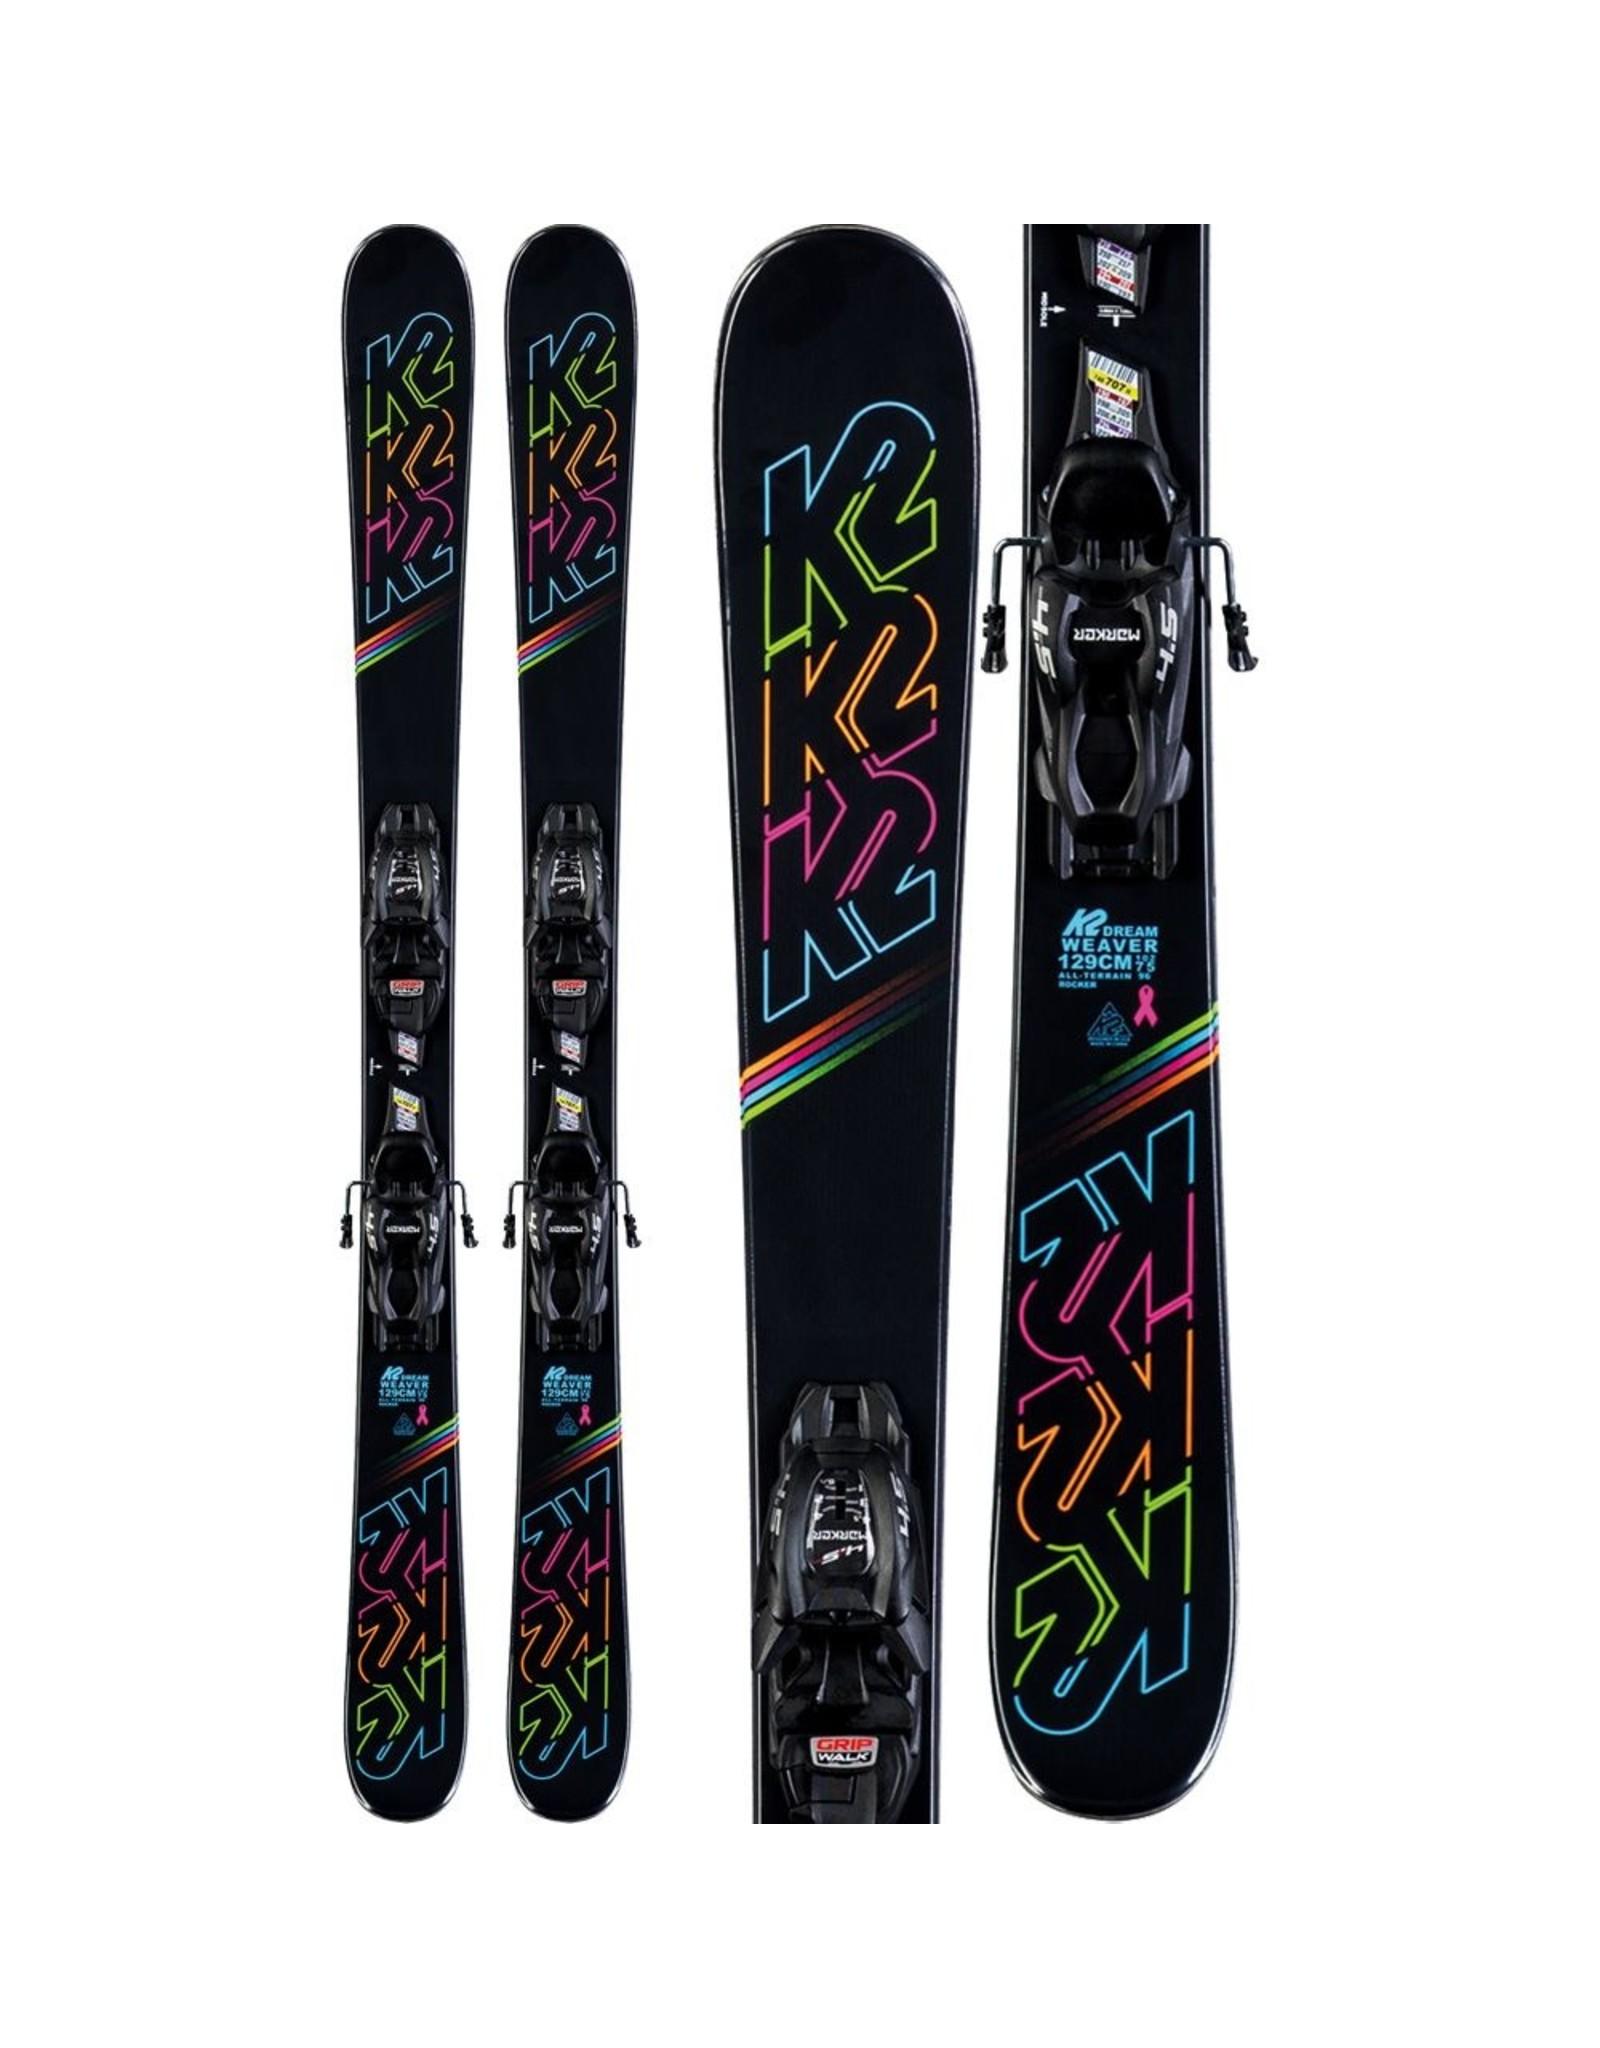 K2 K2 Dreamweaver Jr + 4.5 FDT Binding F19